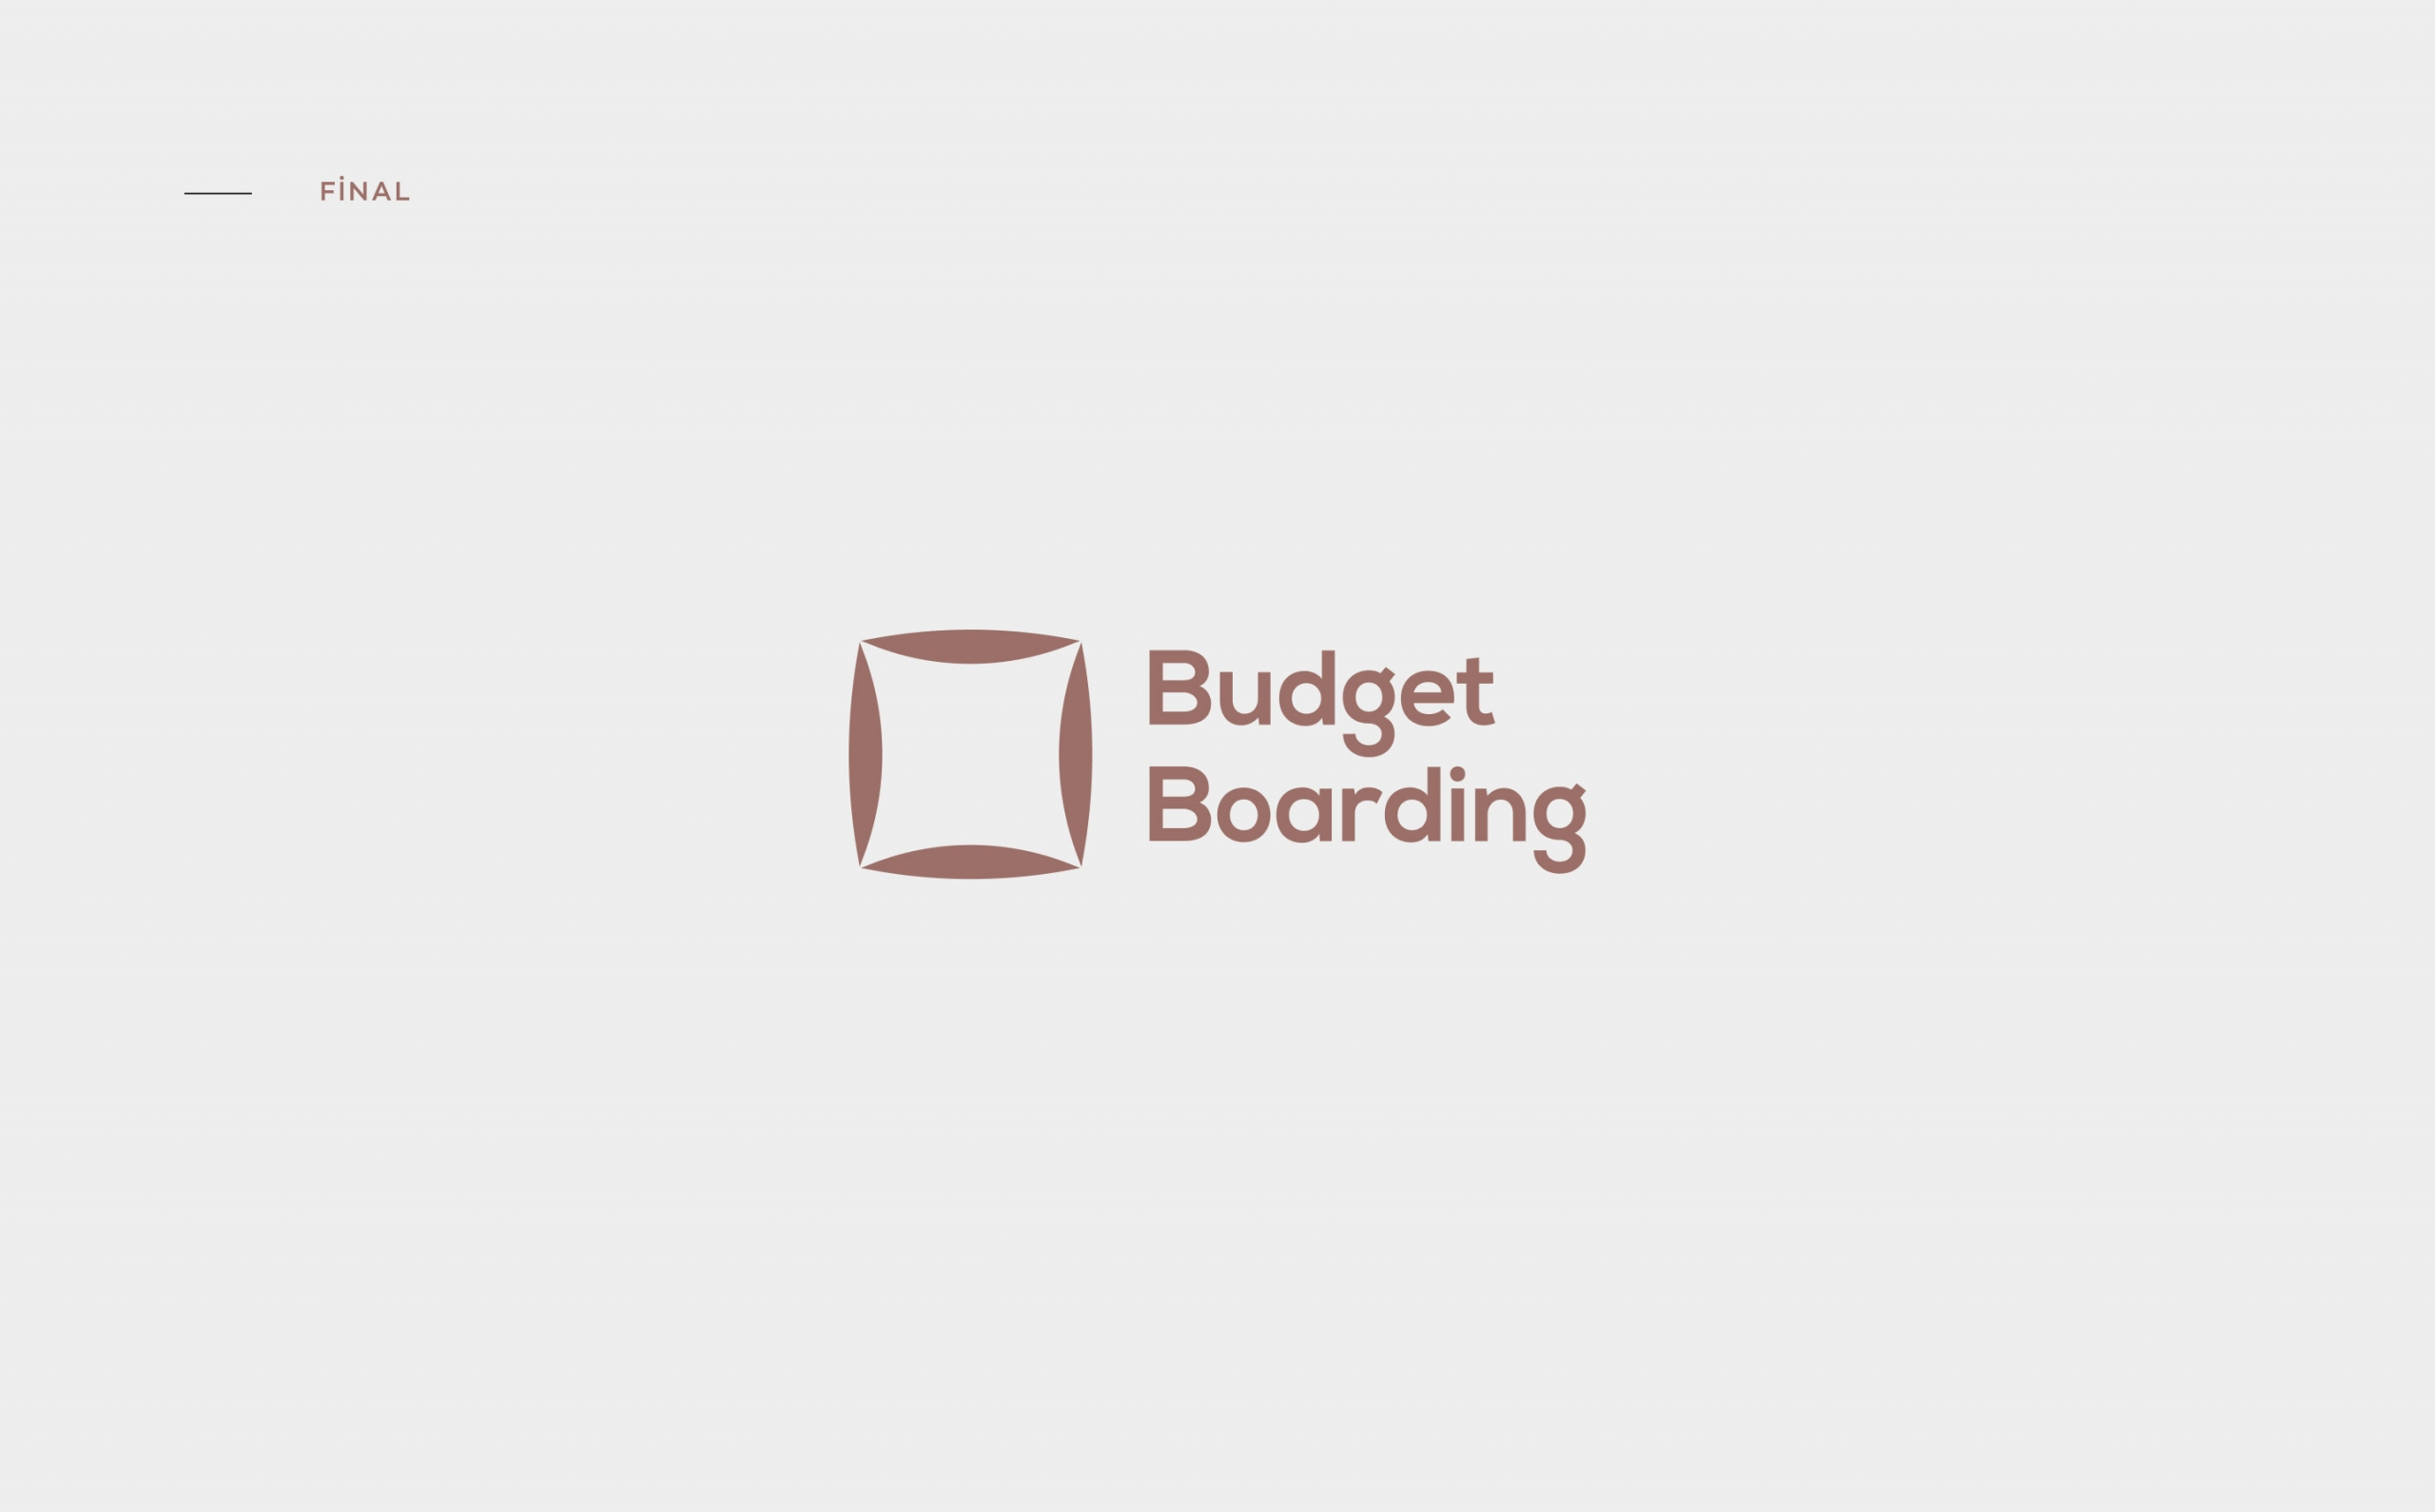 budgetboarding_06